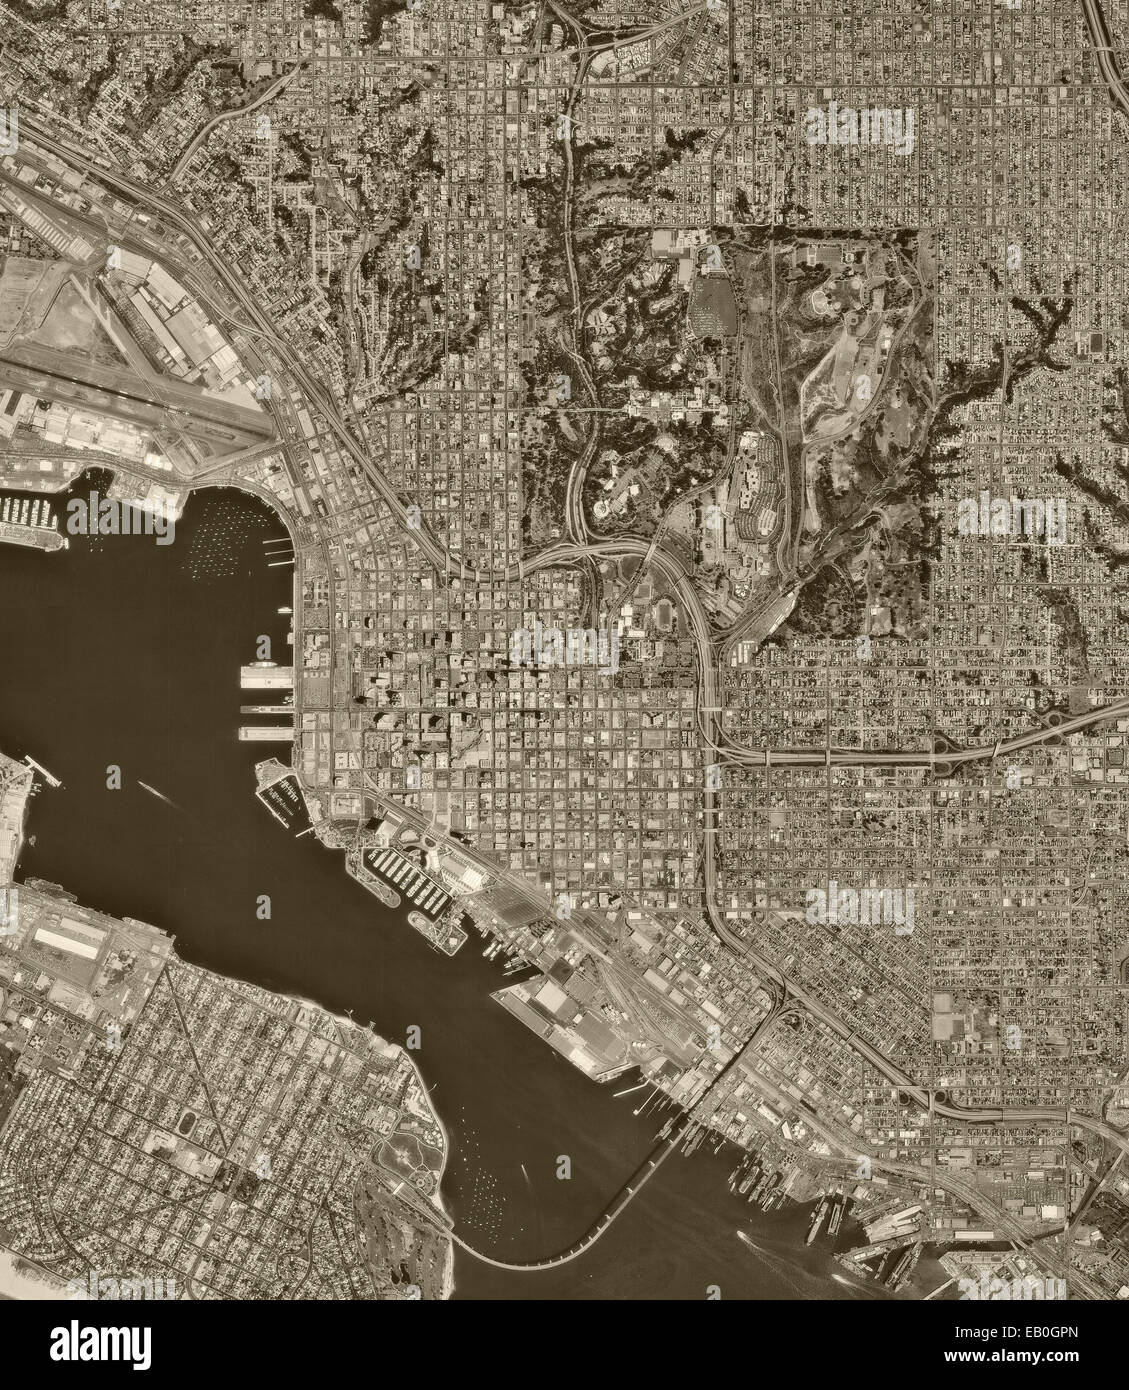 historical aerial photograph San Diego, California, 1994 - Stock Image